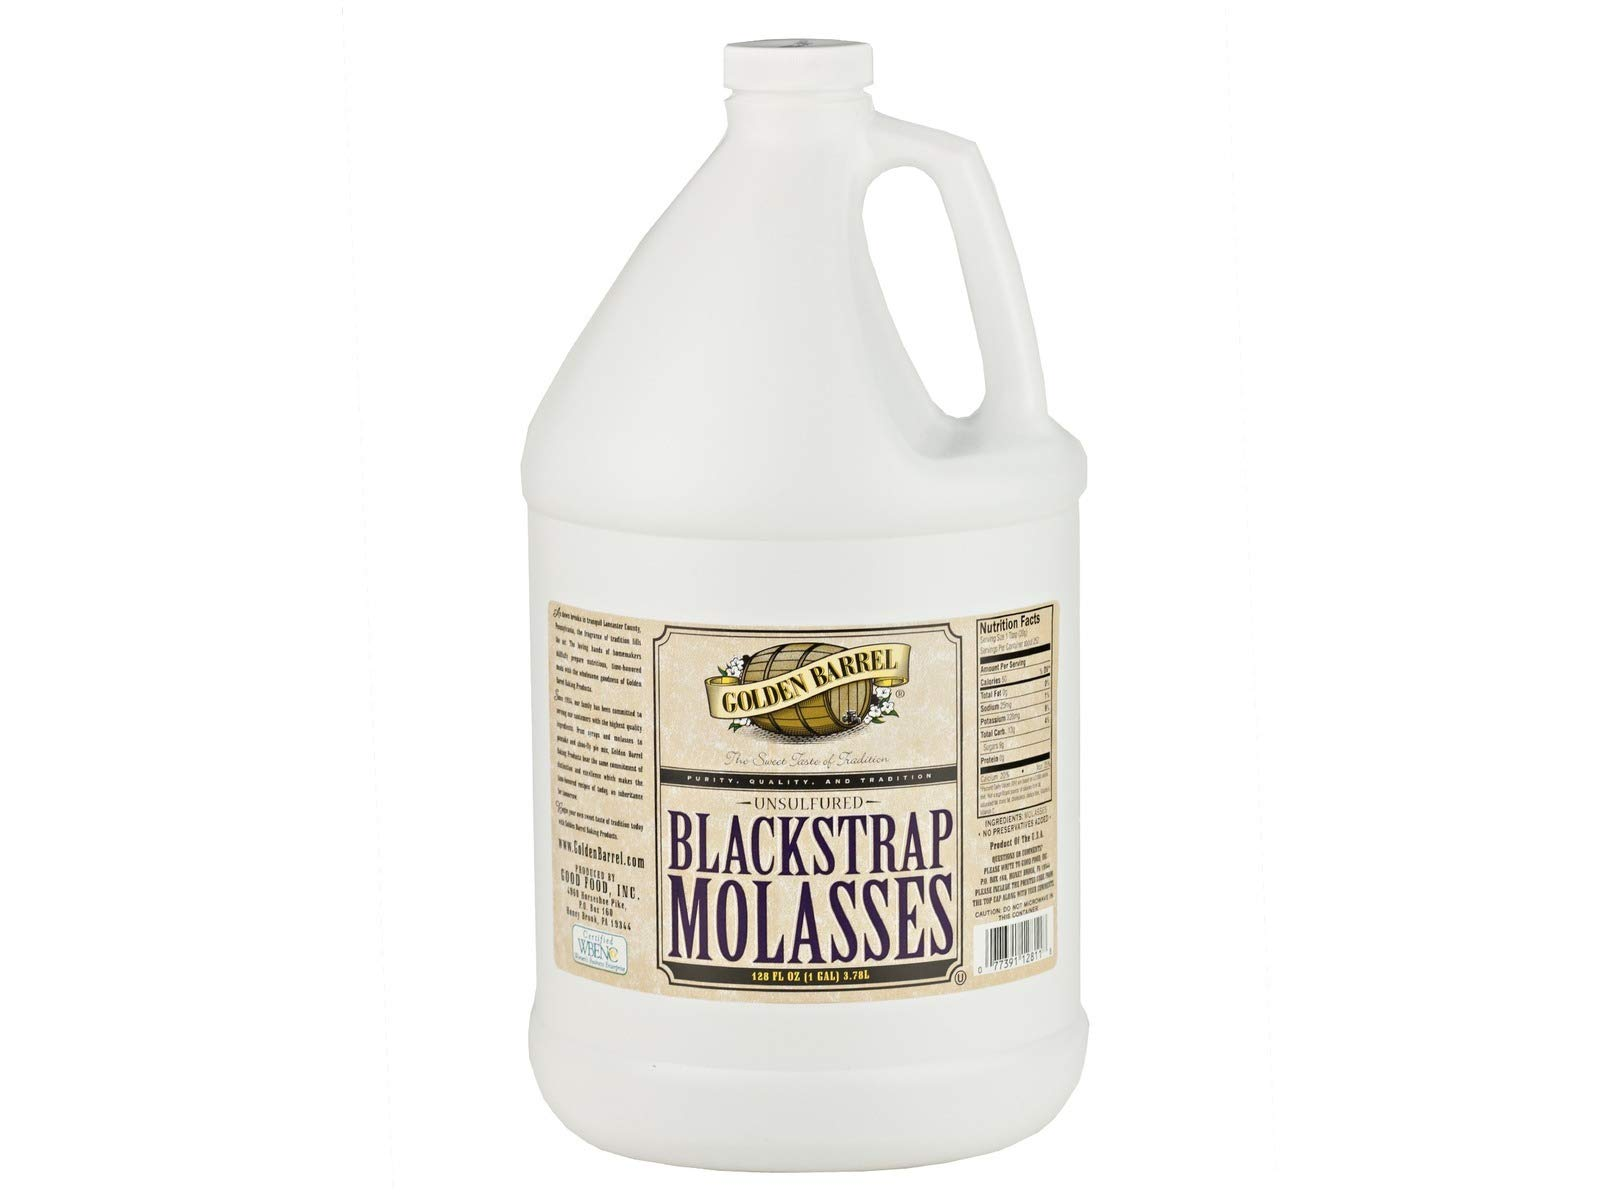 Golden Barrel Unsulfered Blackstrap Molasses (2-1 Gallon Jugs) by Golden Barrel (Image #1)